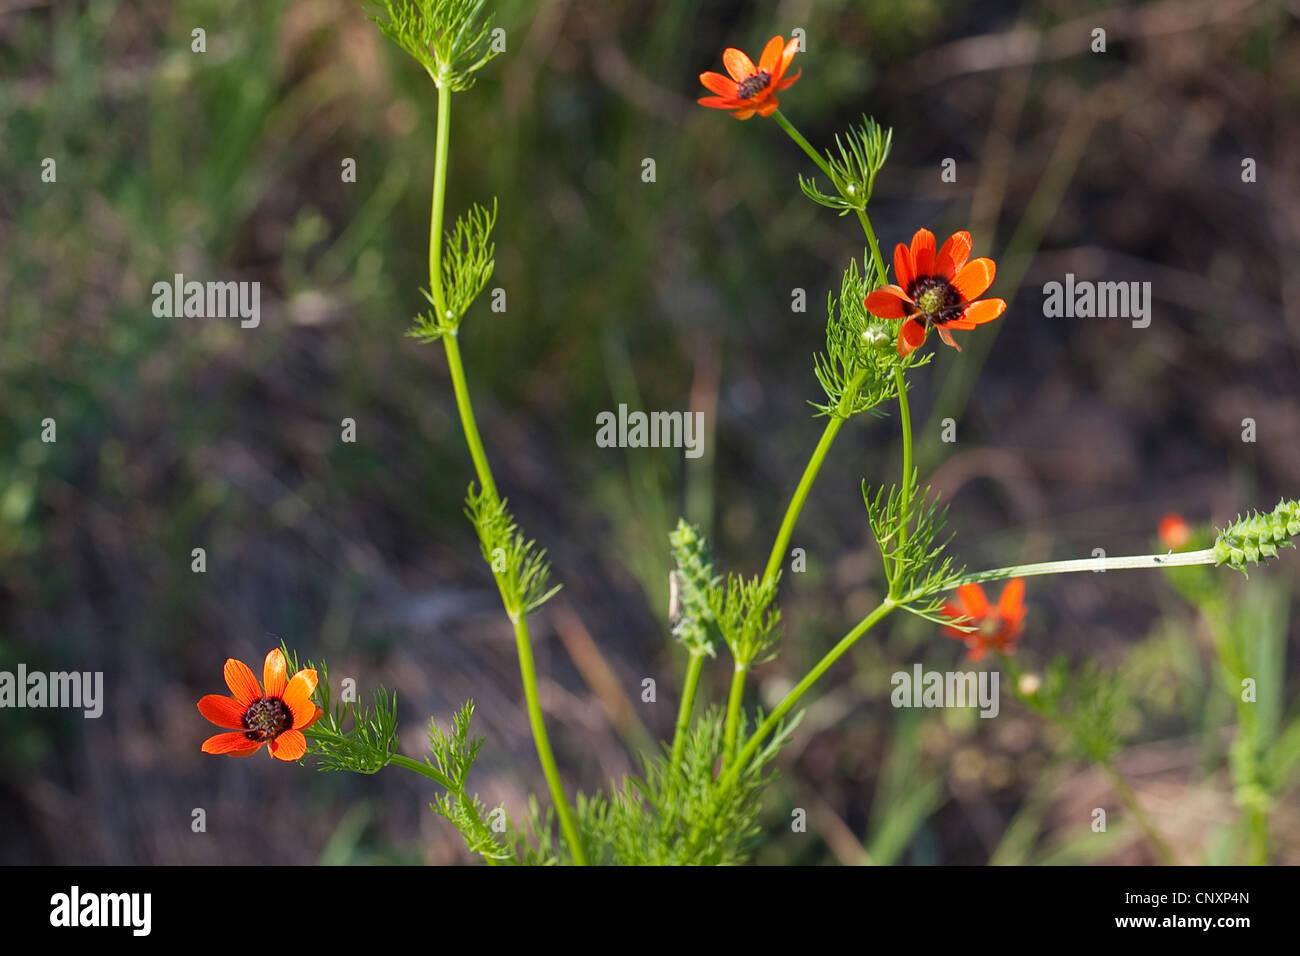 summer pheasant's-eye (Adonis aestivalis), blooming, Germany Stock Photo